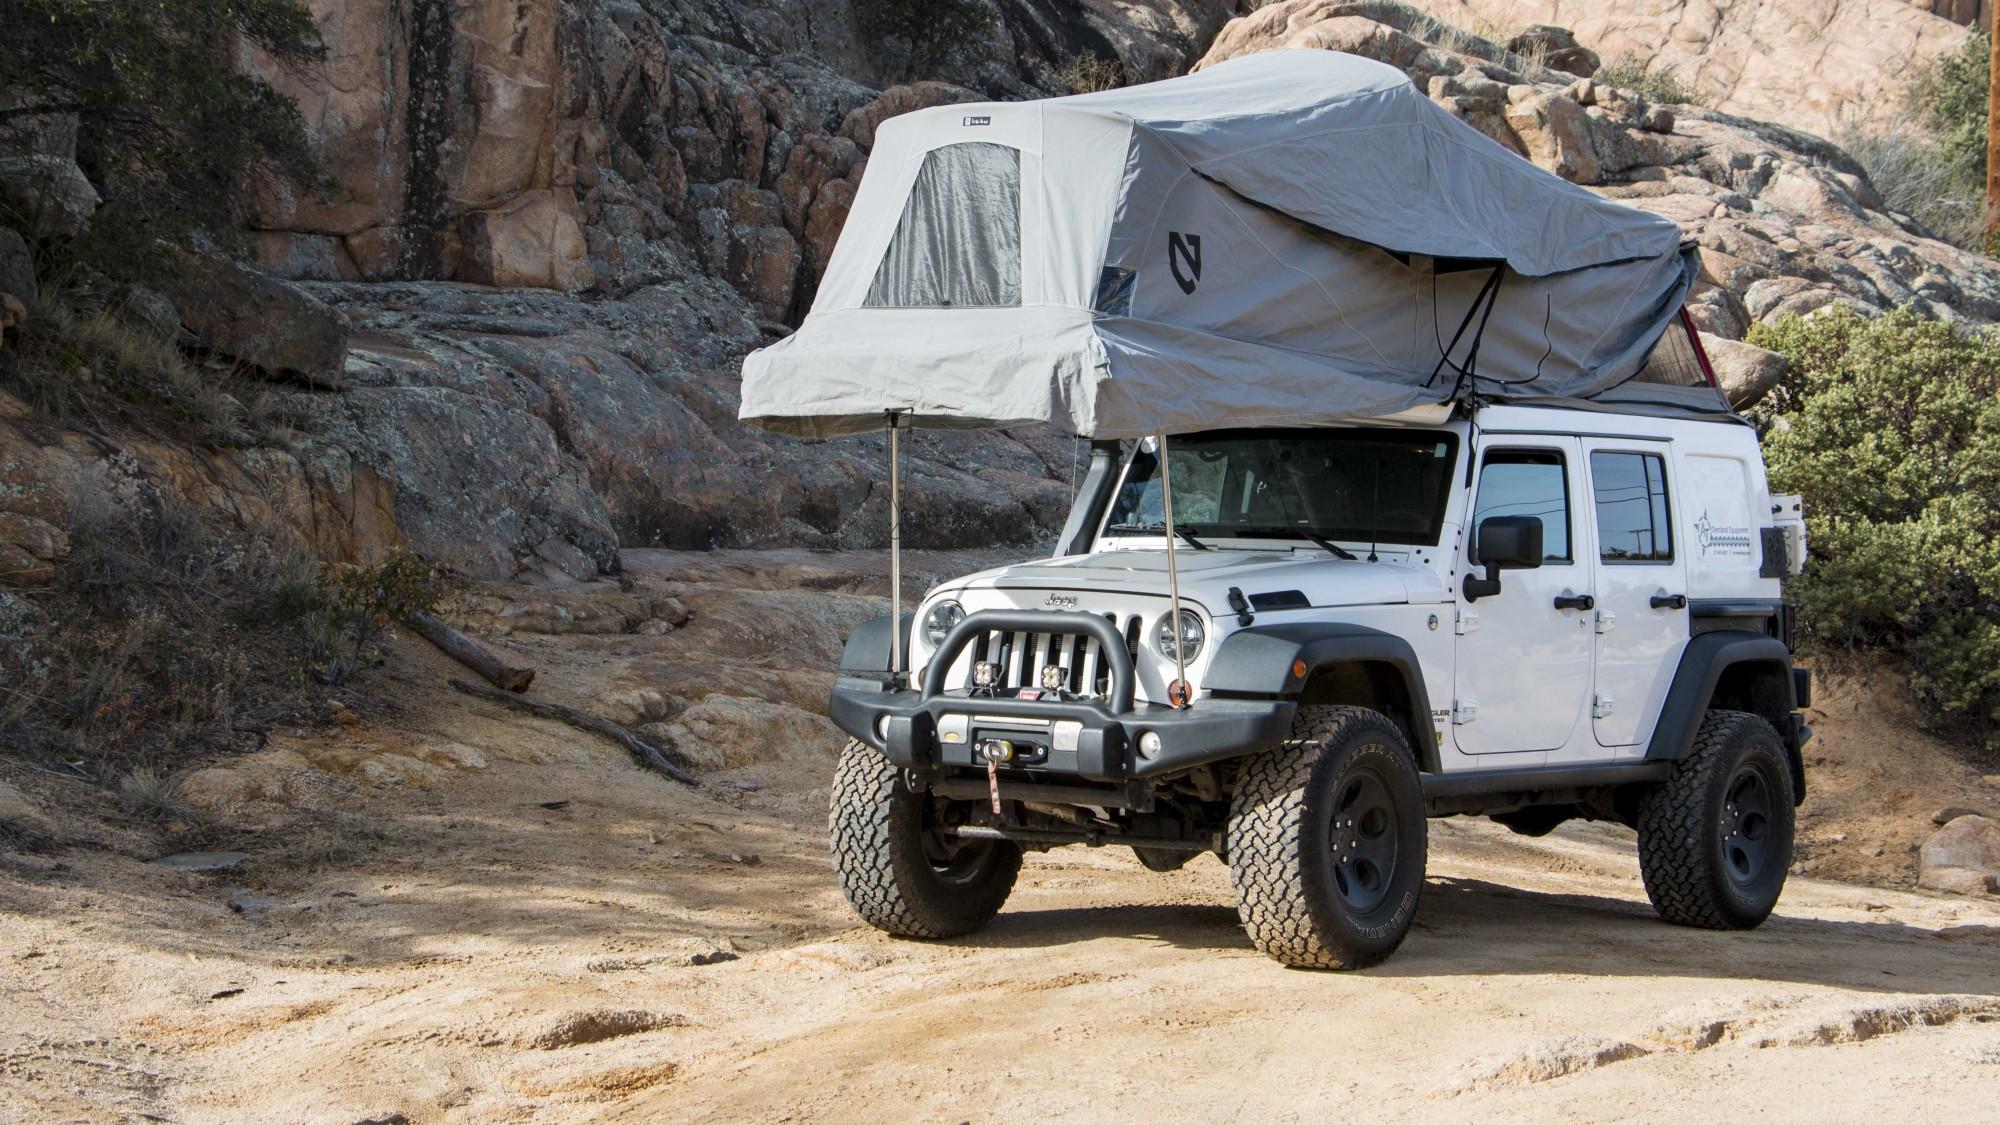 featured vehicle at overland jeep jk expedition portal. Black Bedroom Furniture Sets. Home Design Ideas